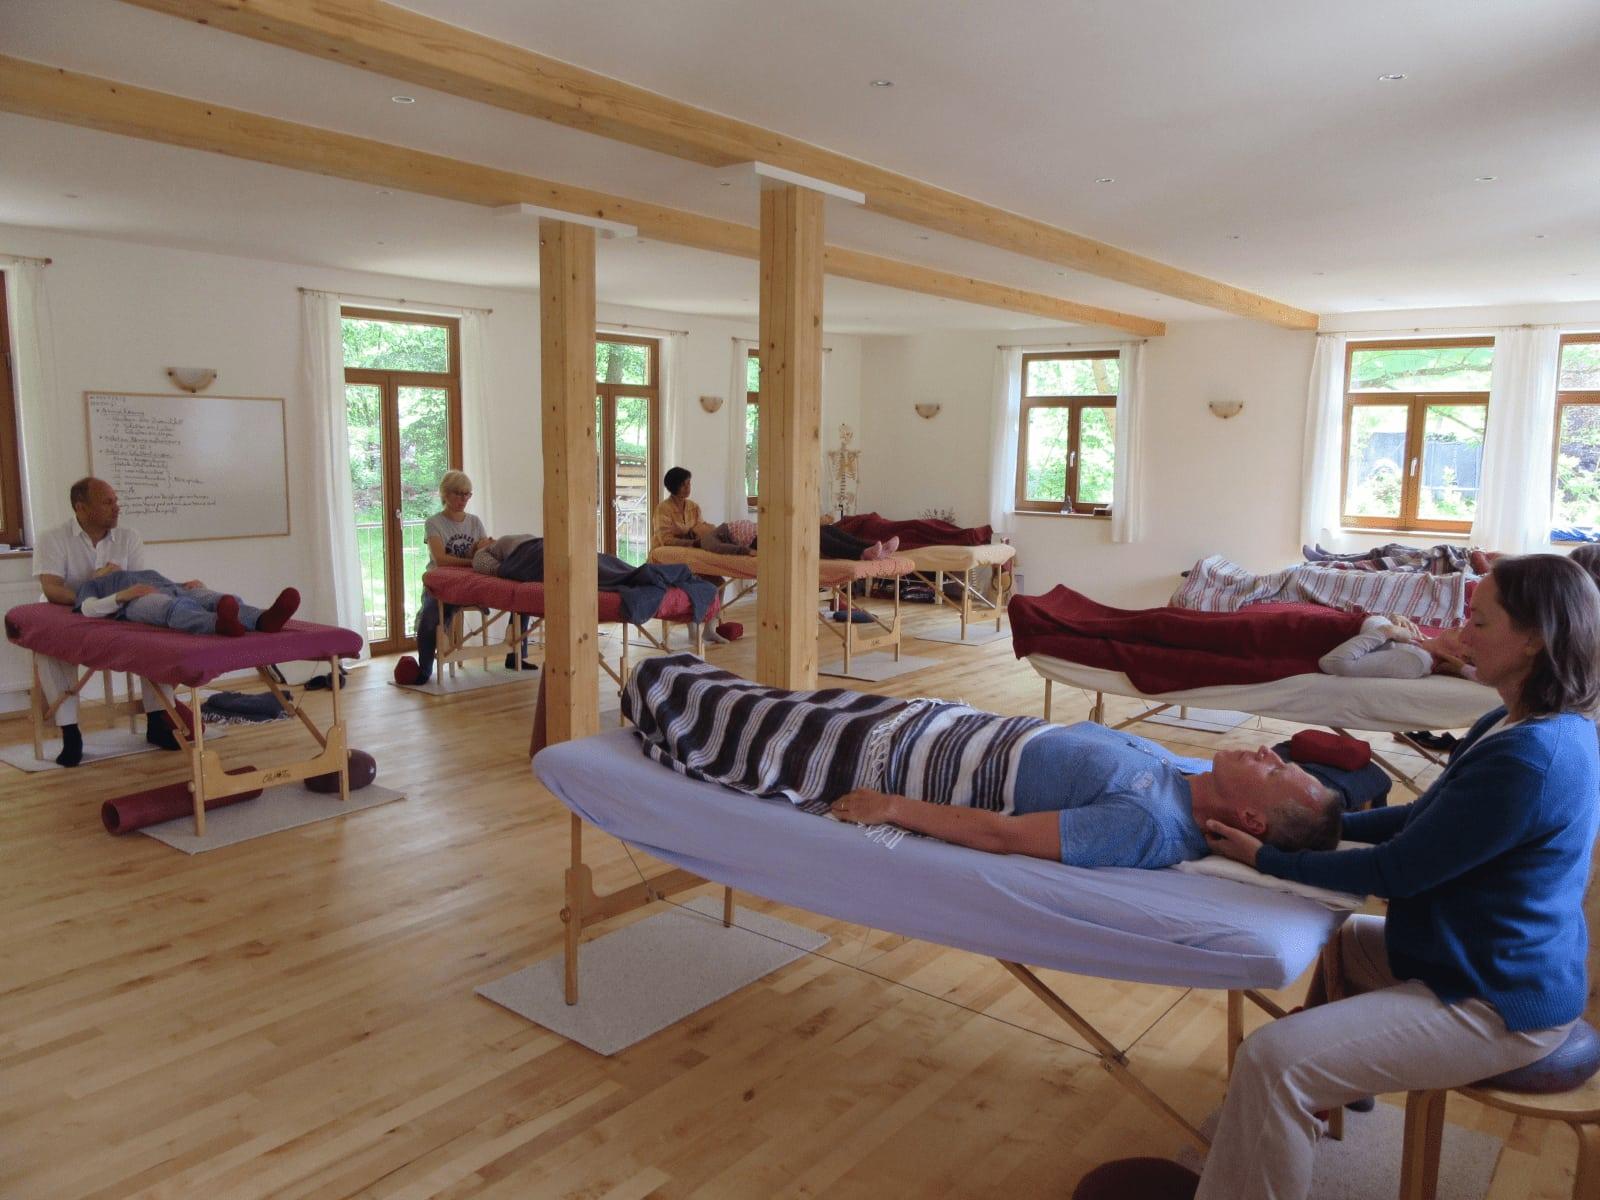 Craniosacral Healing Ausbildung Seminar - Ein Kurs im Seminarraum